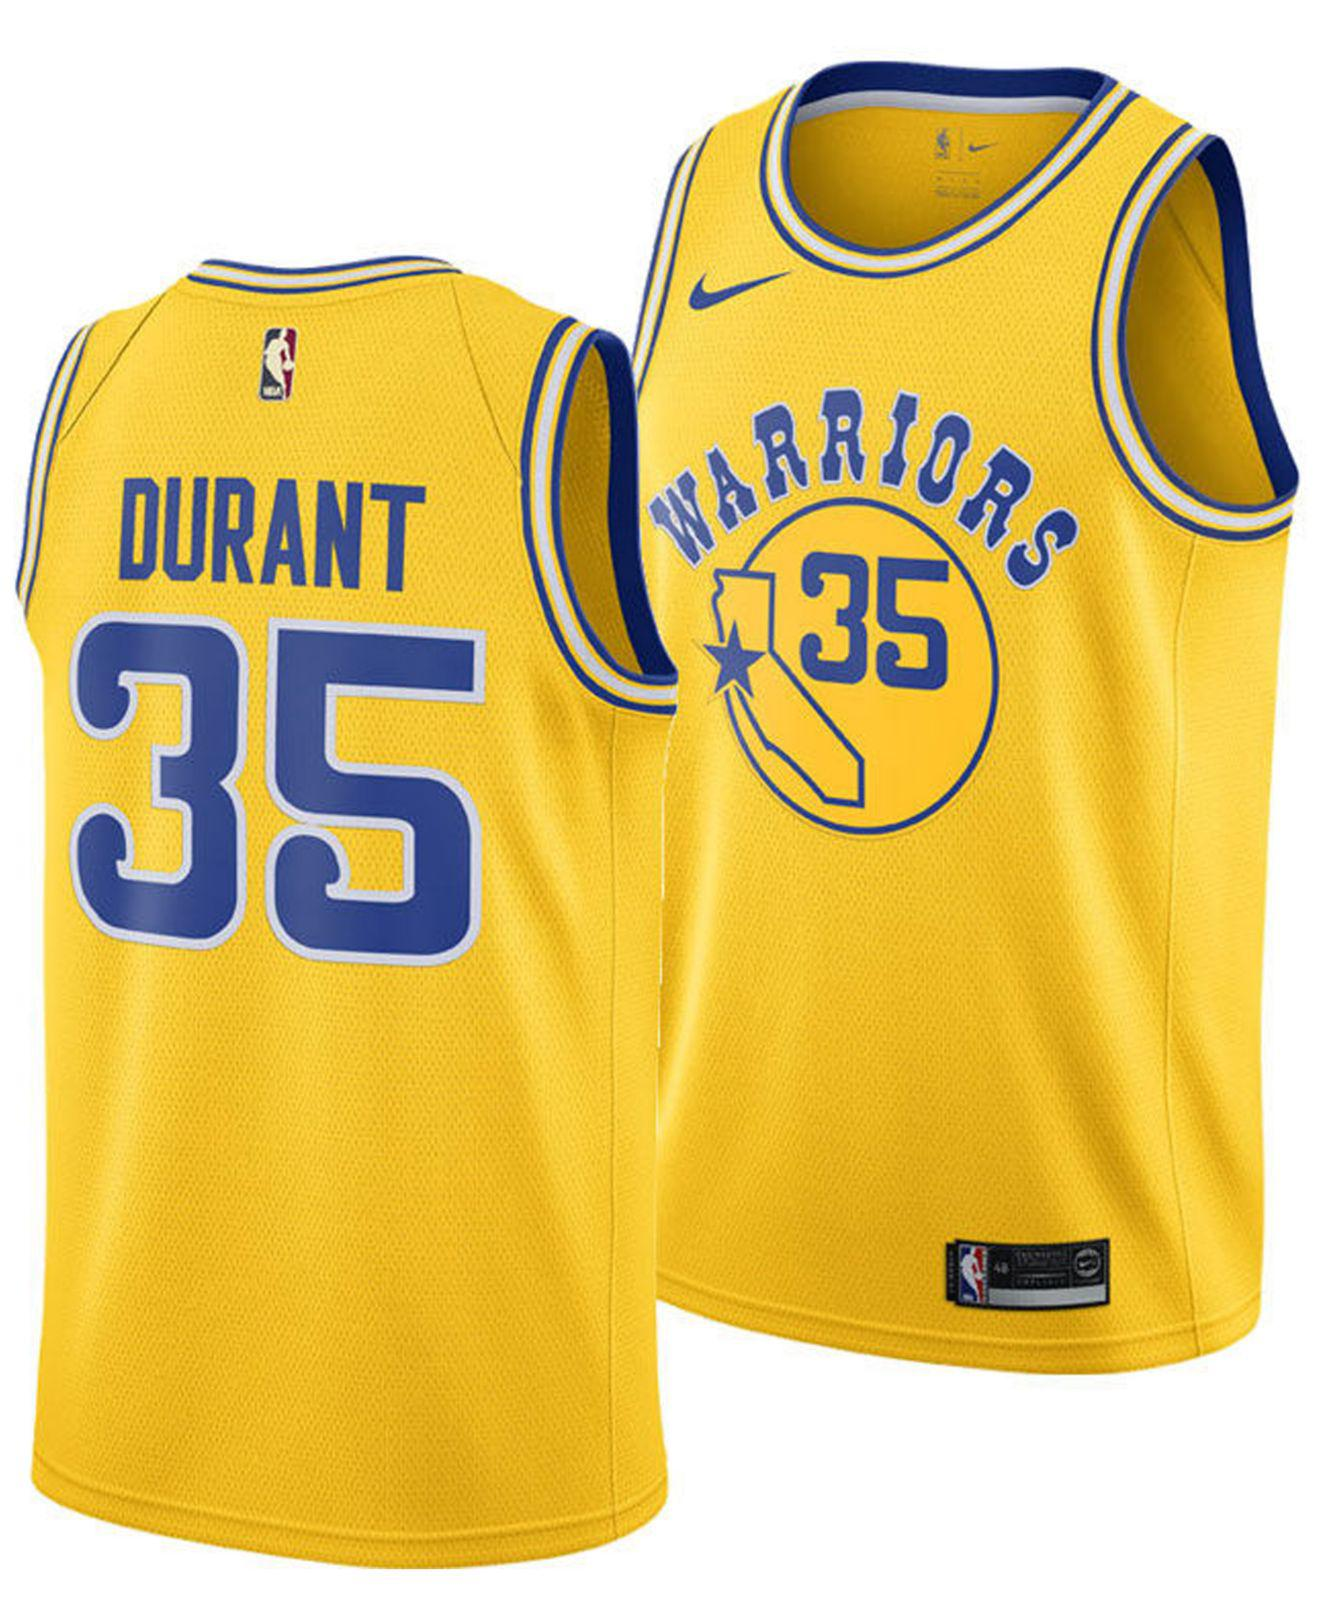 629f176d6 Nike. Men s Yellow Kevin Durant Golden State Warriors Hardwood Classic  Swingman Jersey